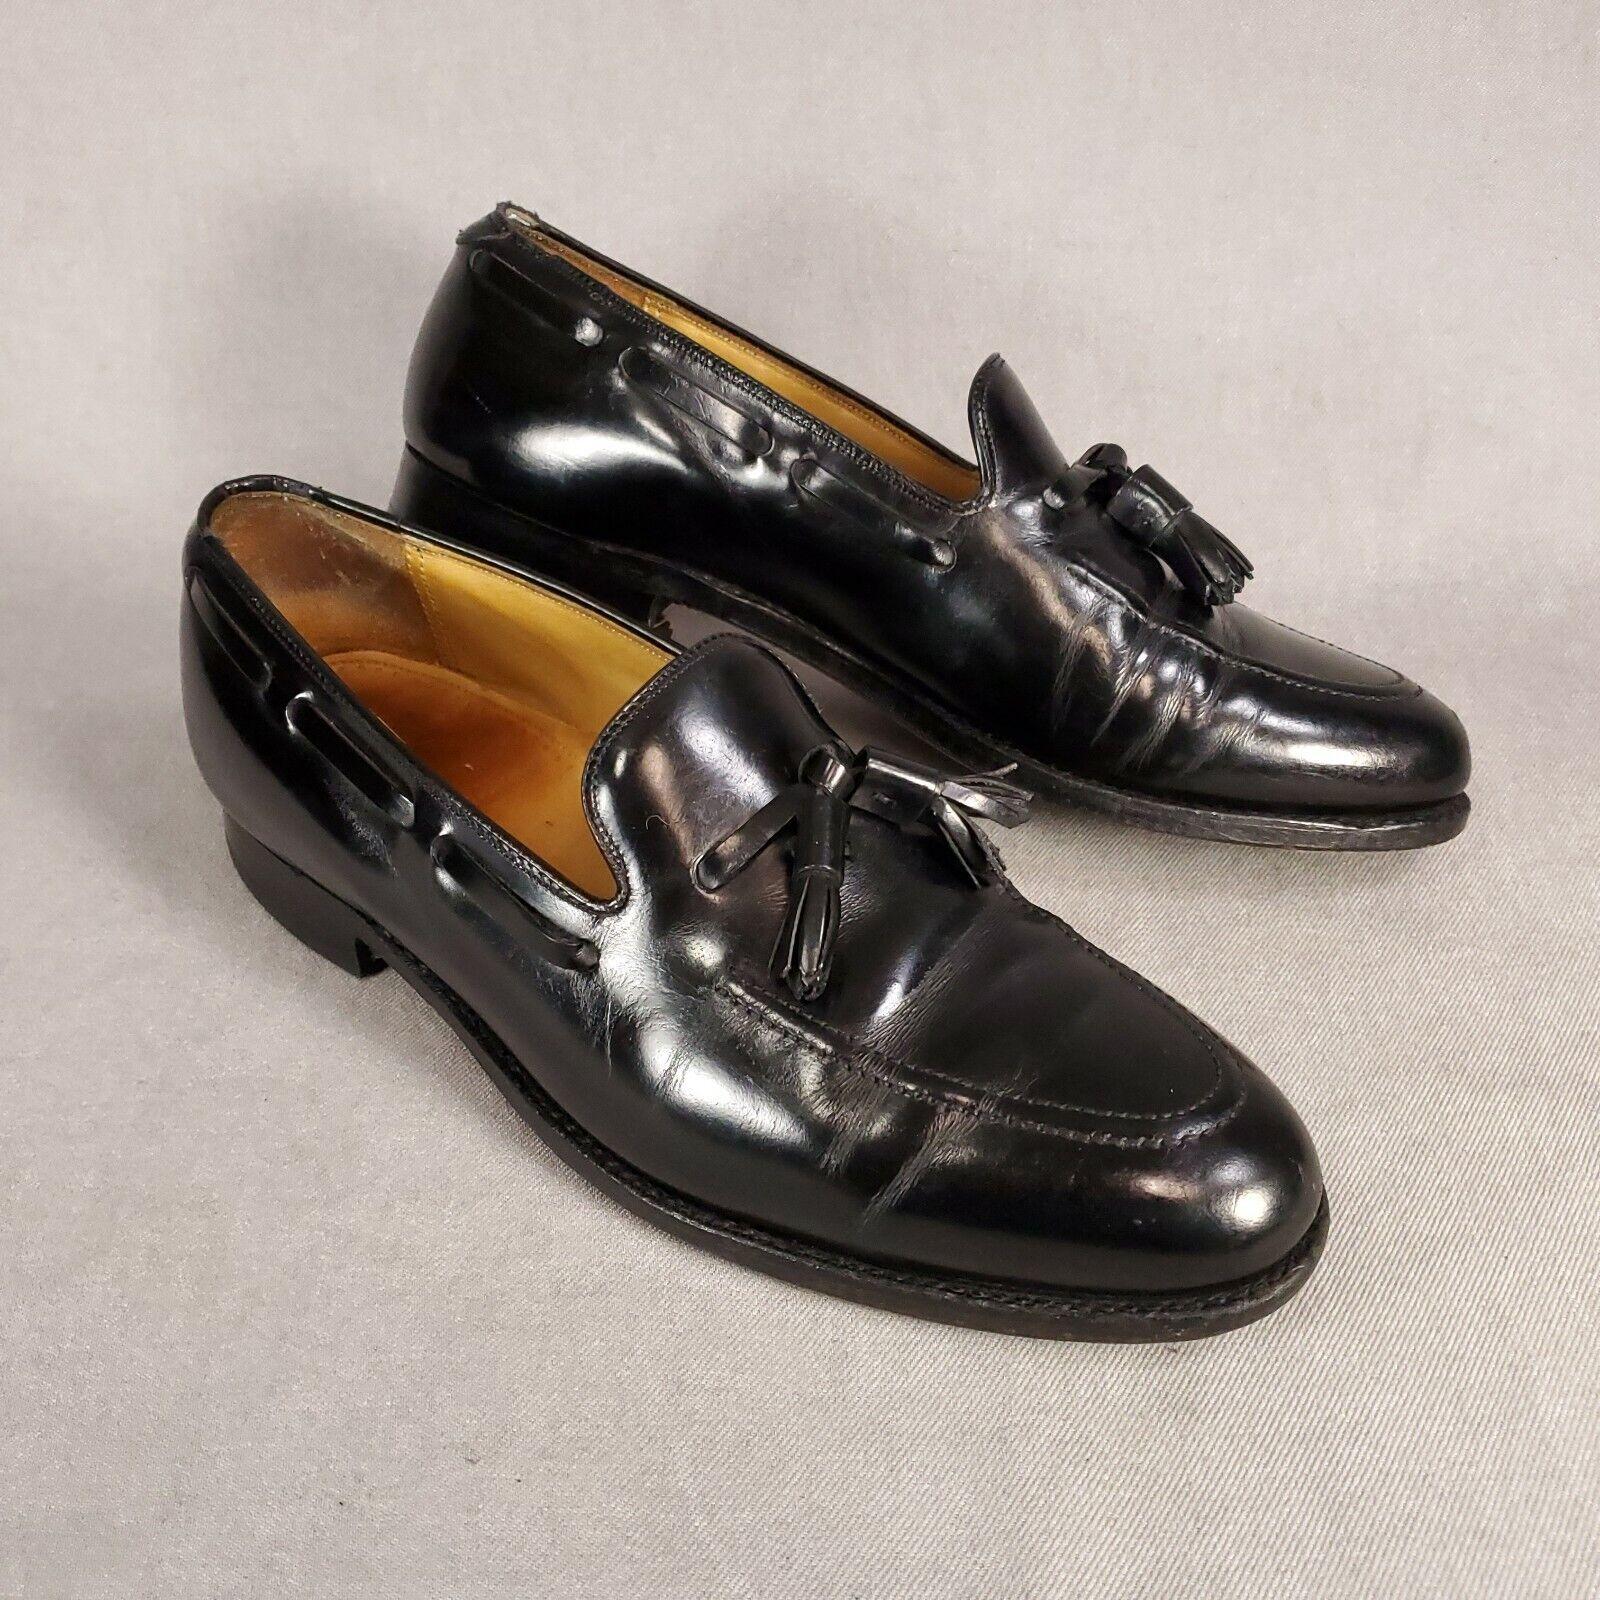 Johnston & Murphy Executive Glasgow Split Toe Black Oxford Men's US 10 M Leather